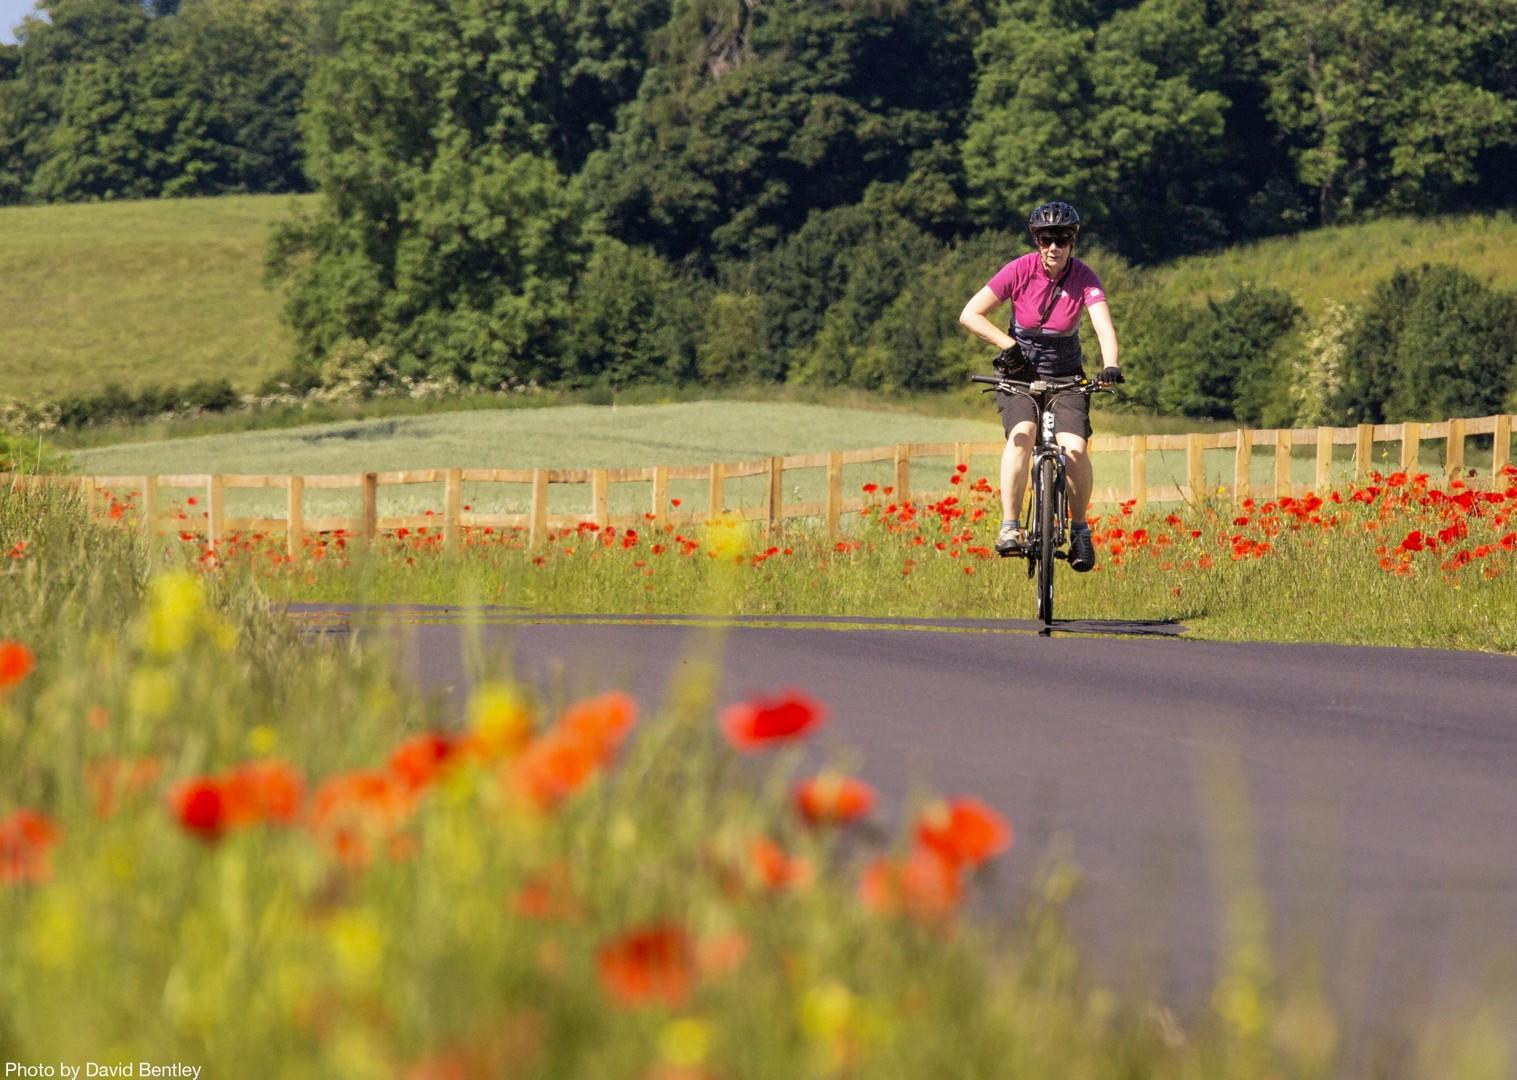 Self-Guided-Leisure-Cycling-Holiday-Hadrians-Cycleway-UK-cycle-Corbridge.jpg - UK - Hadrian's Cycleway - 4 Days Cycling - Self-Guided Leisure Cycling Holiday - Leisure Cycling